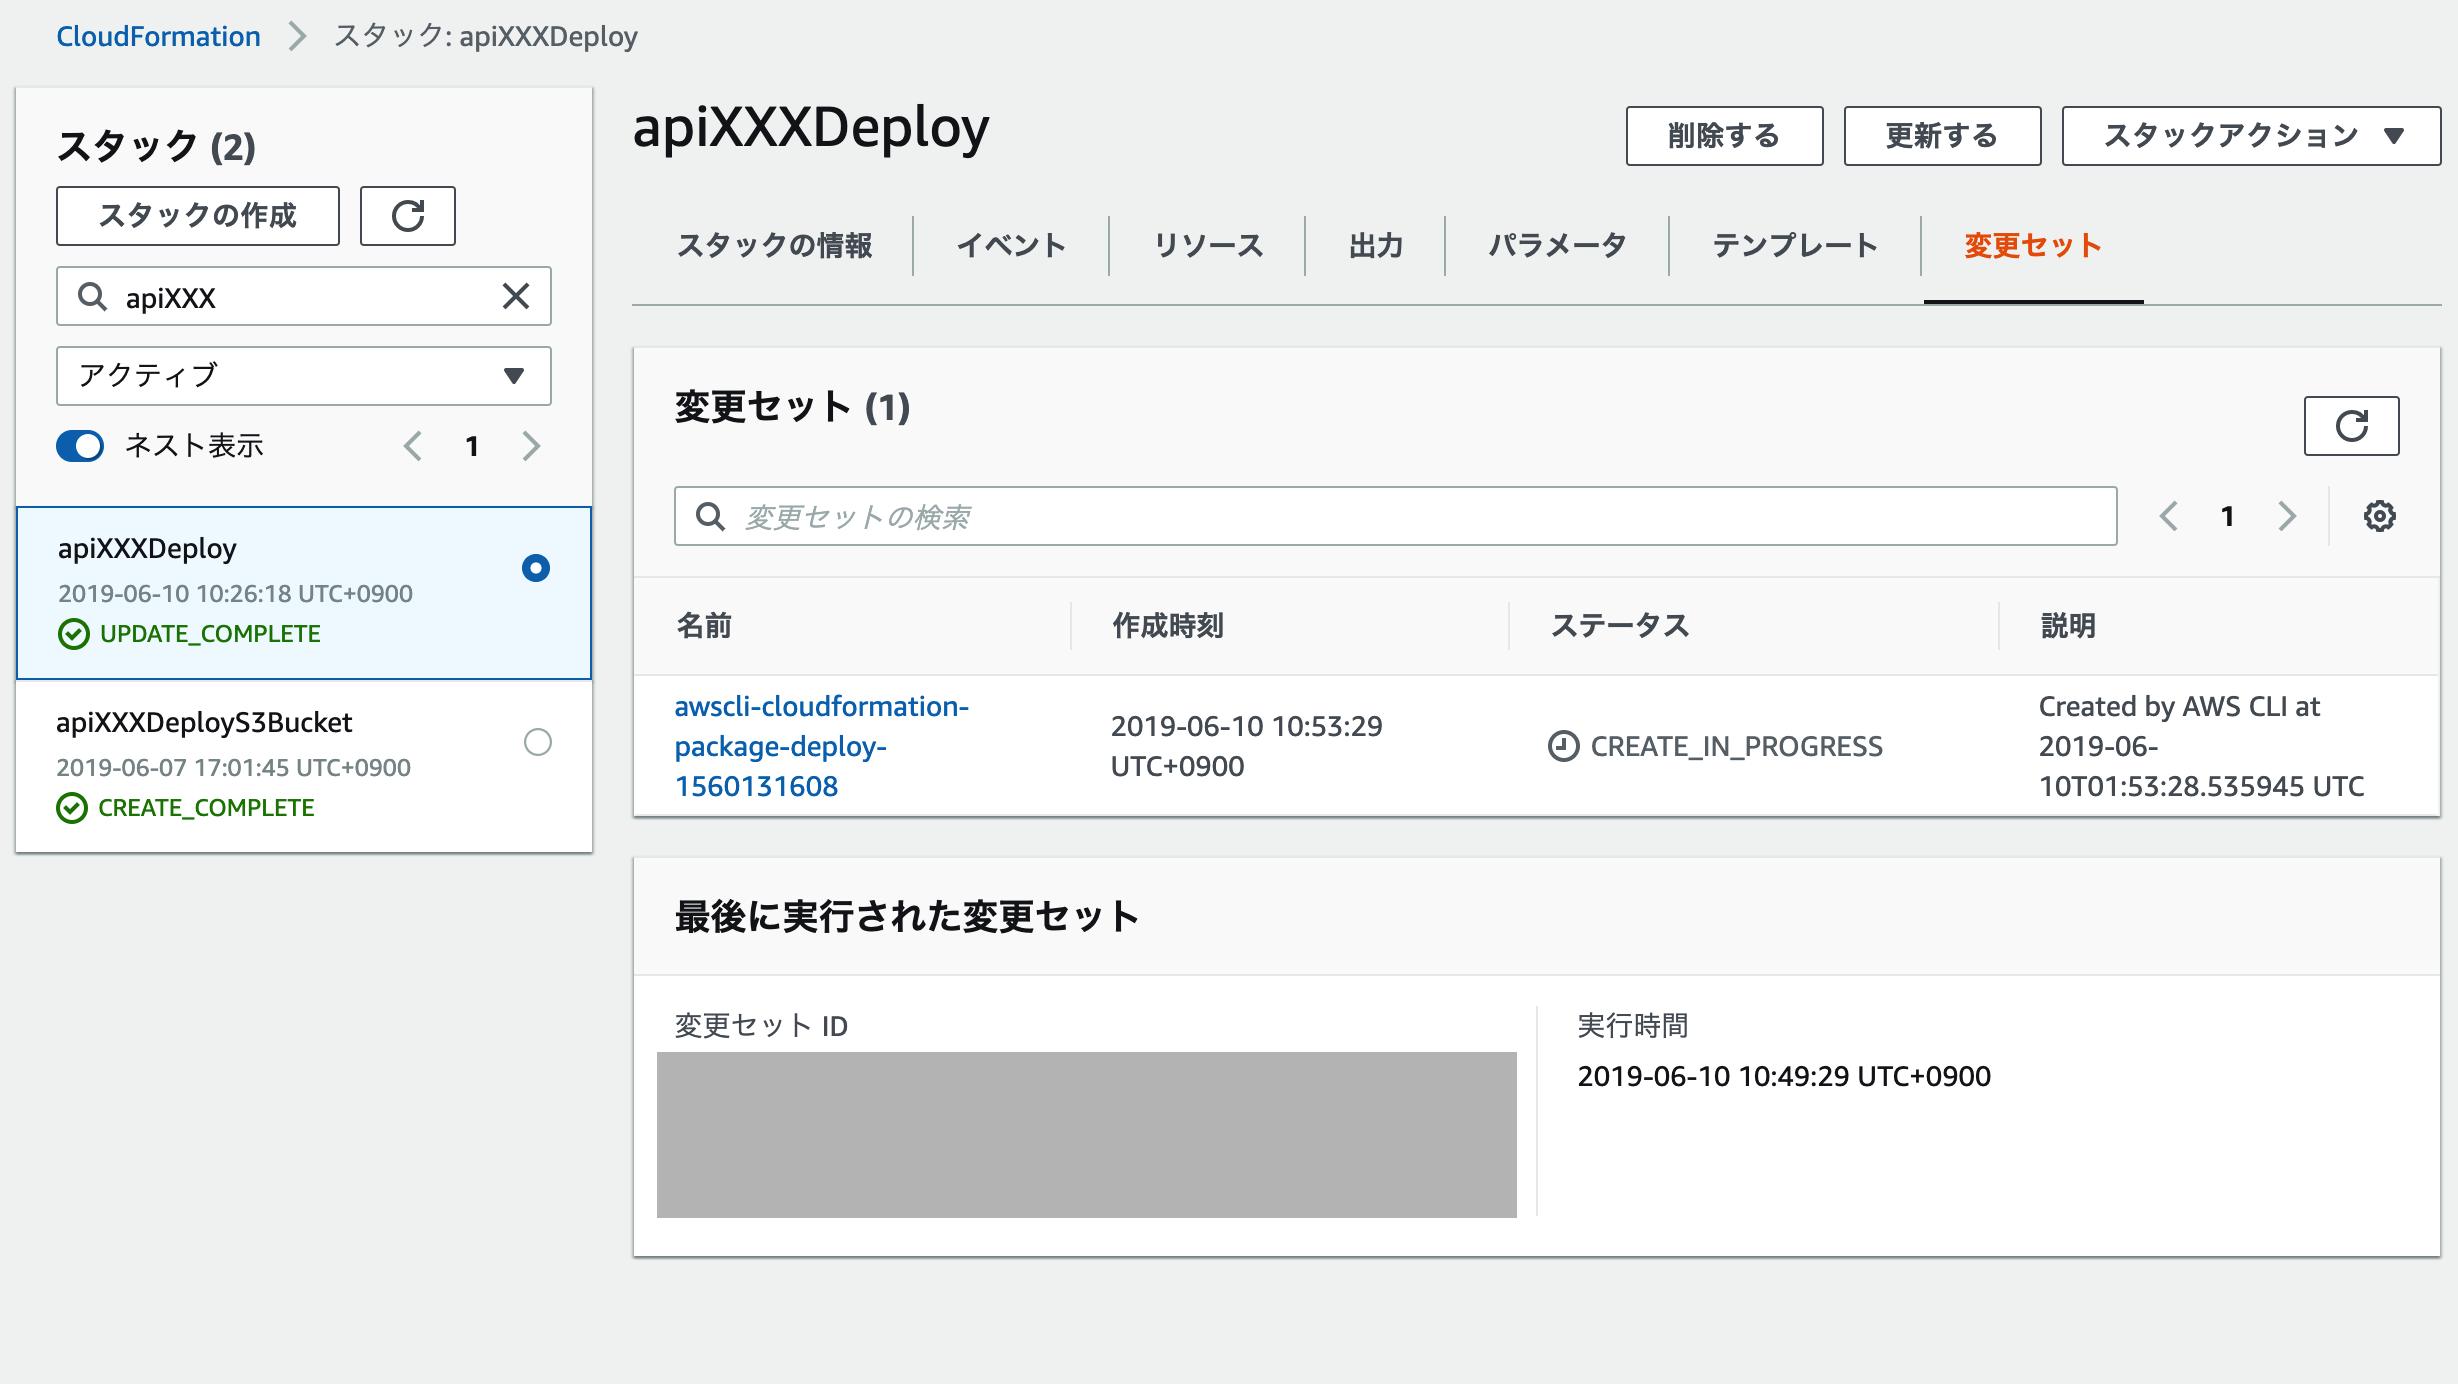 CloudFormationでAPI Gateway+LambdaなAPIを作成する - Qiita